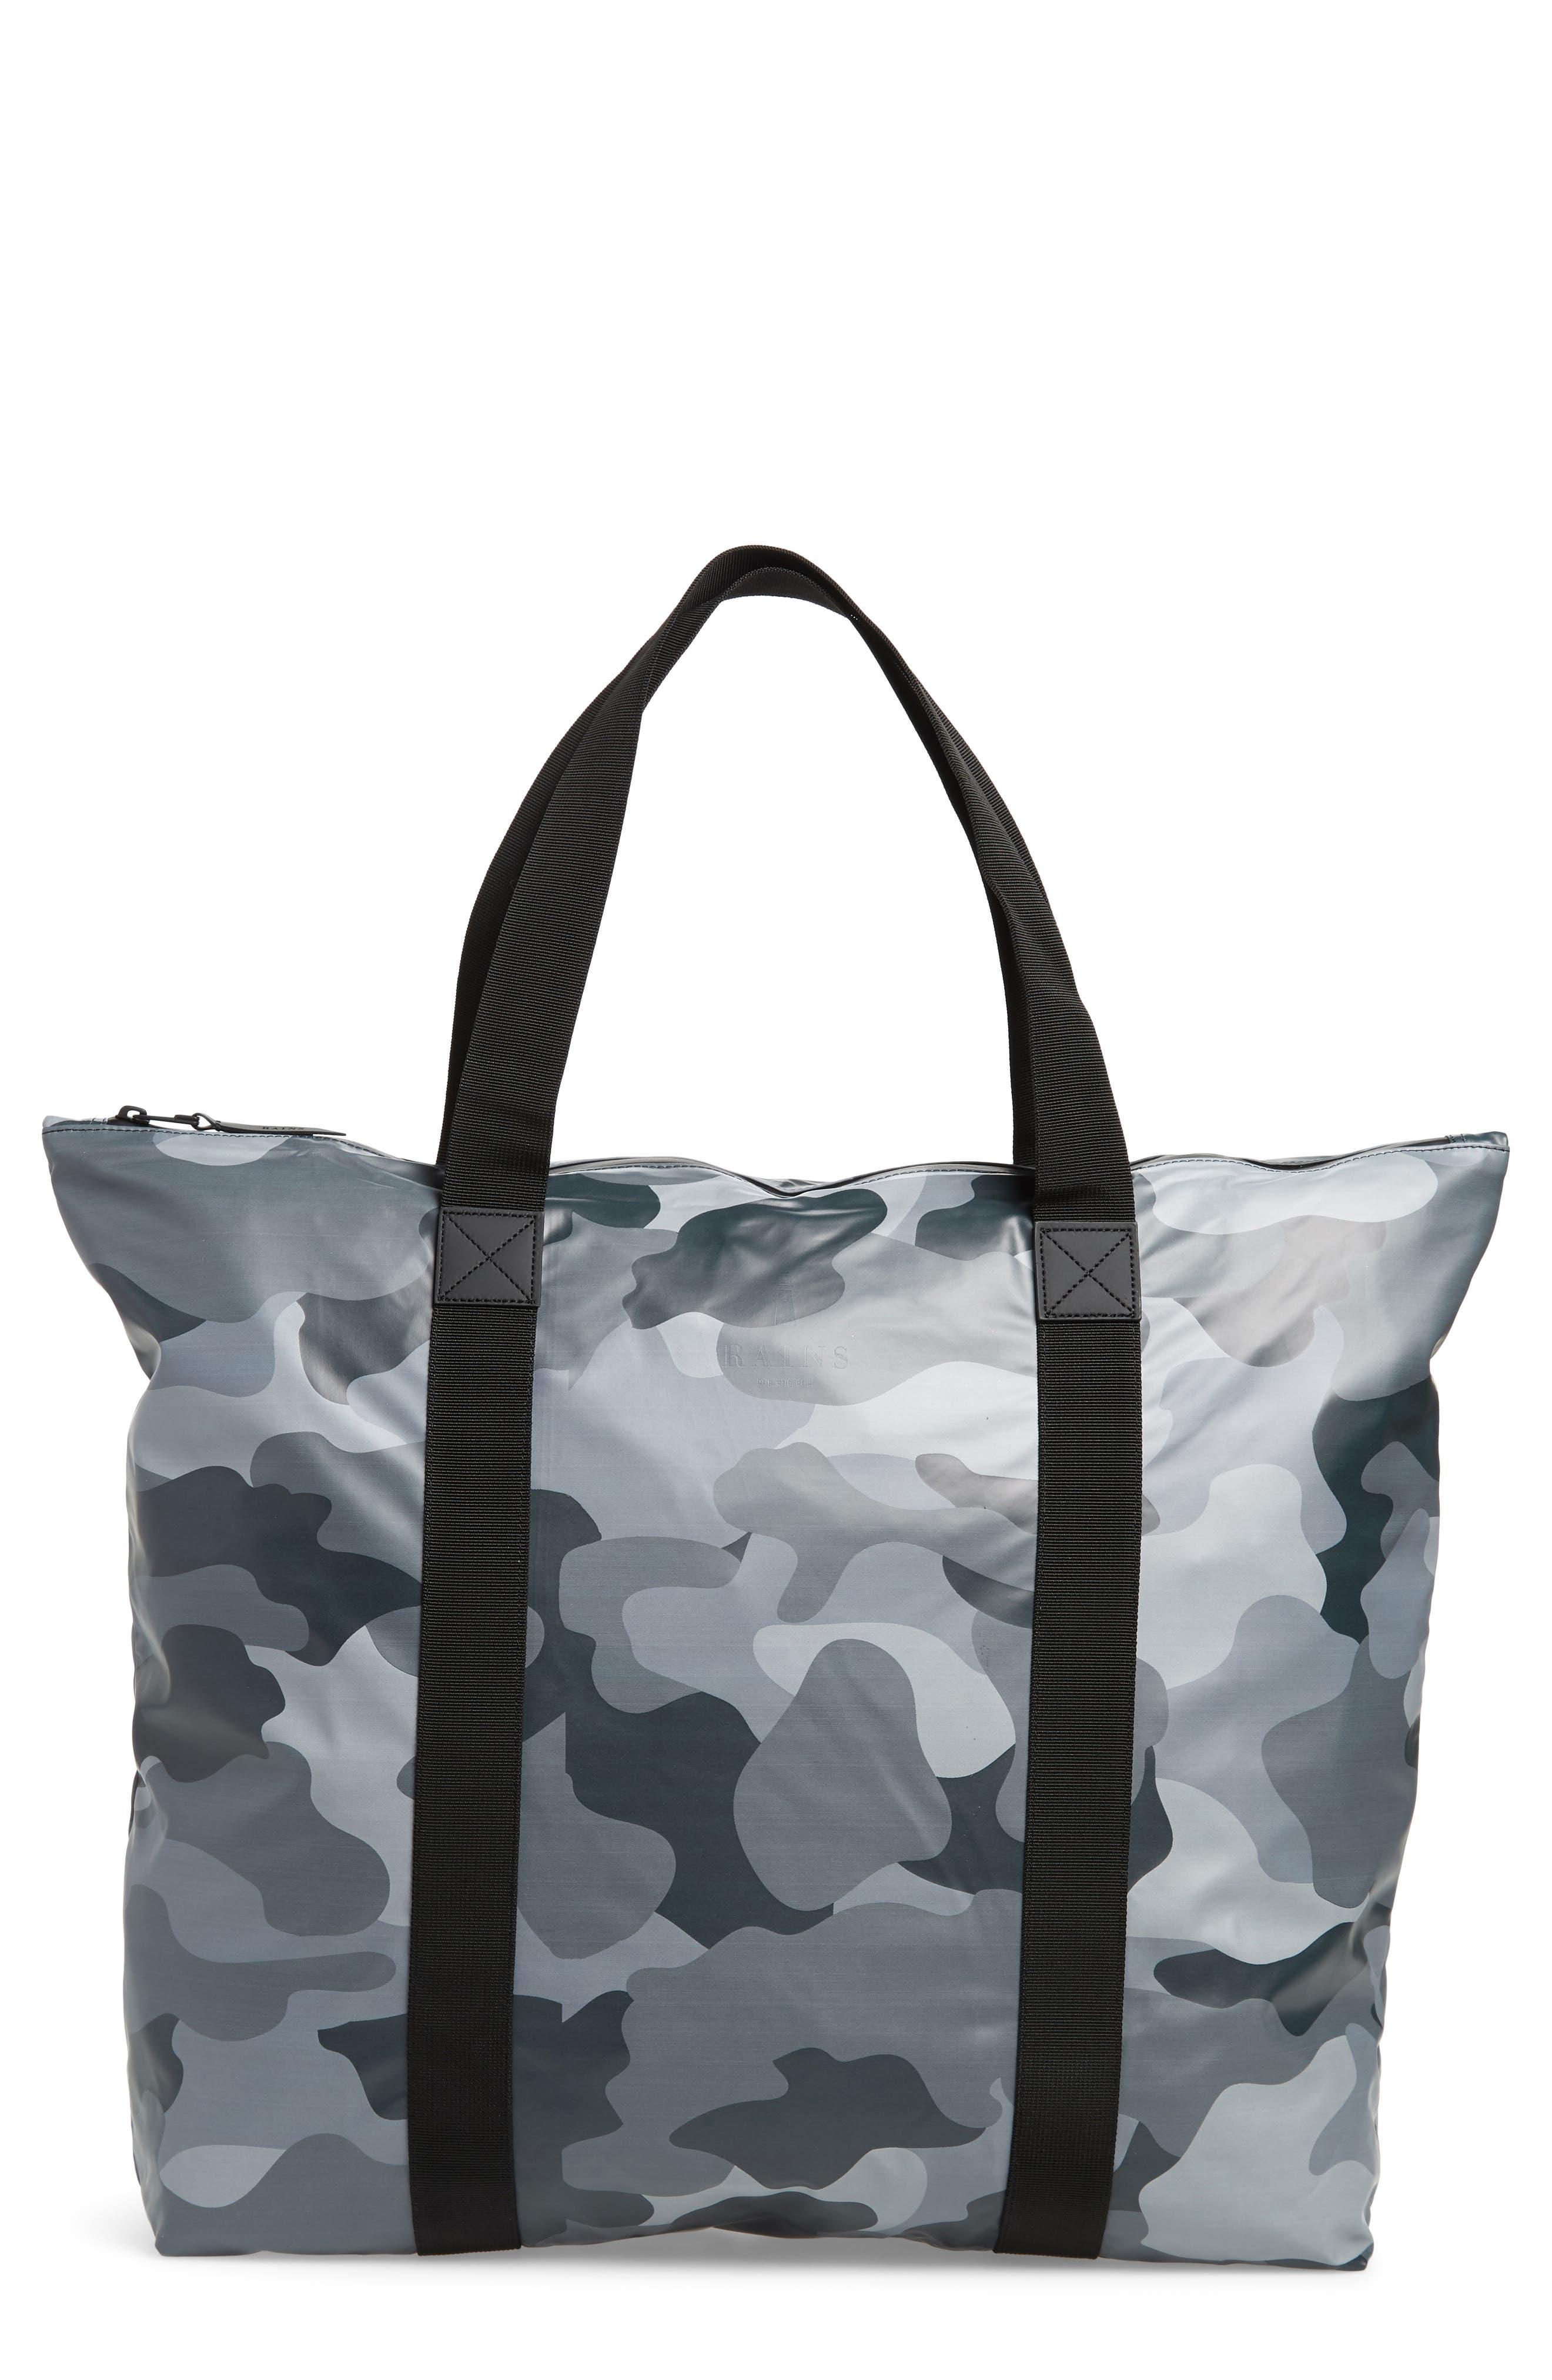 Camo Print Tote Bag,                         Main,                         color, NIGHT CAMO